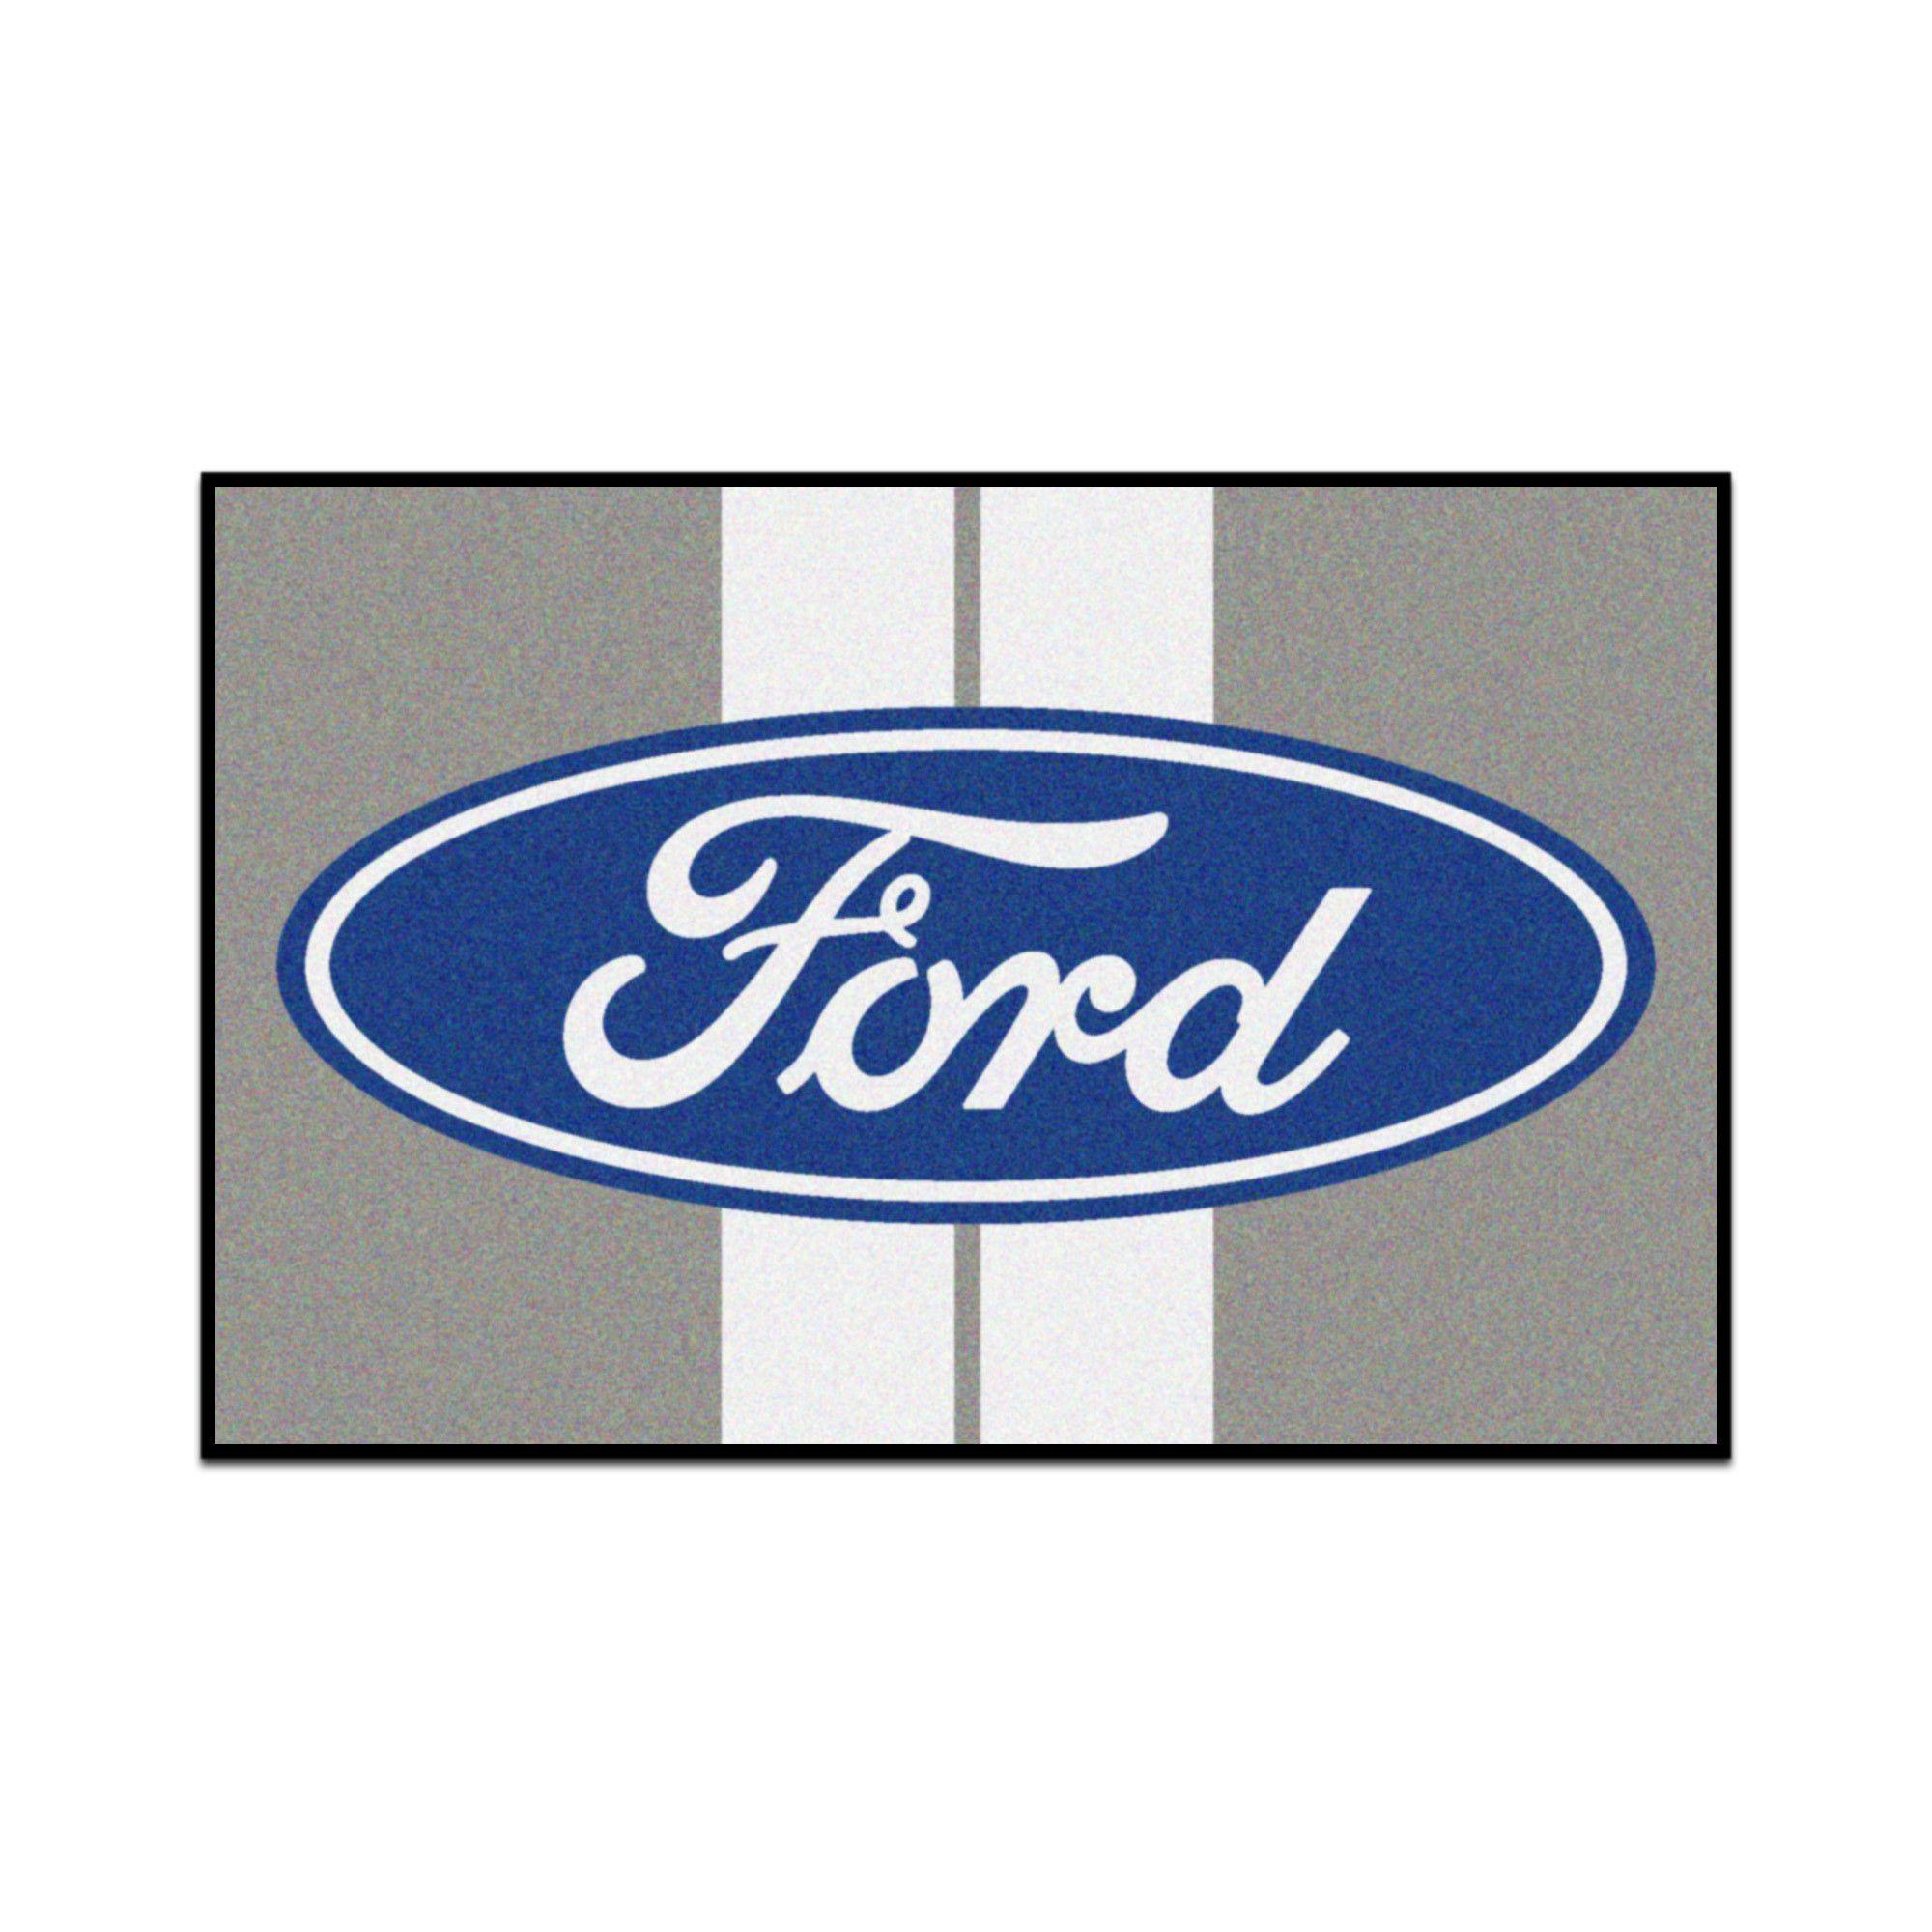 Ford Grey Indoor Outdoor Use Area Rug Logos De Coches Emblema